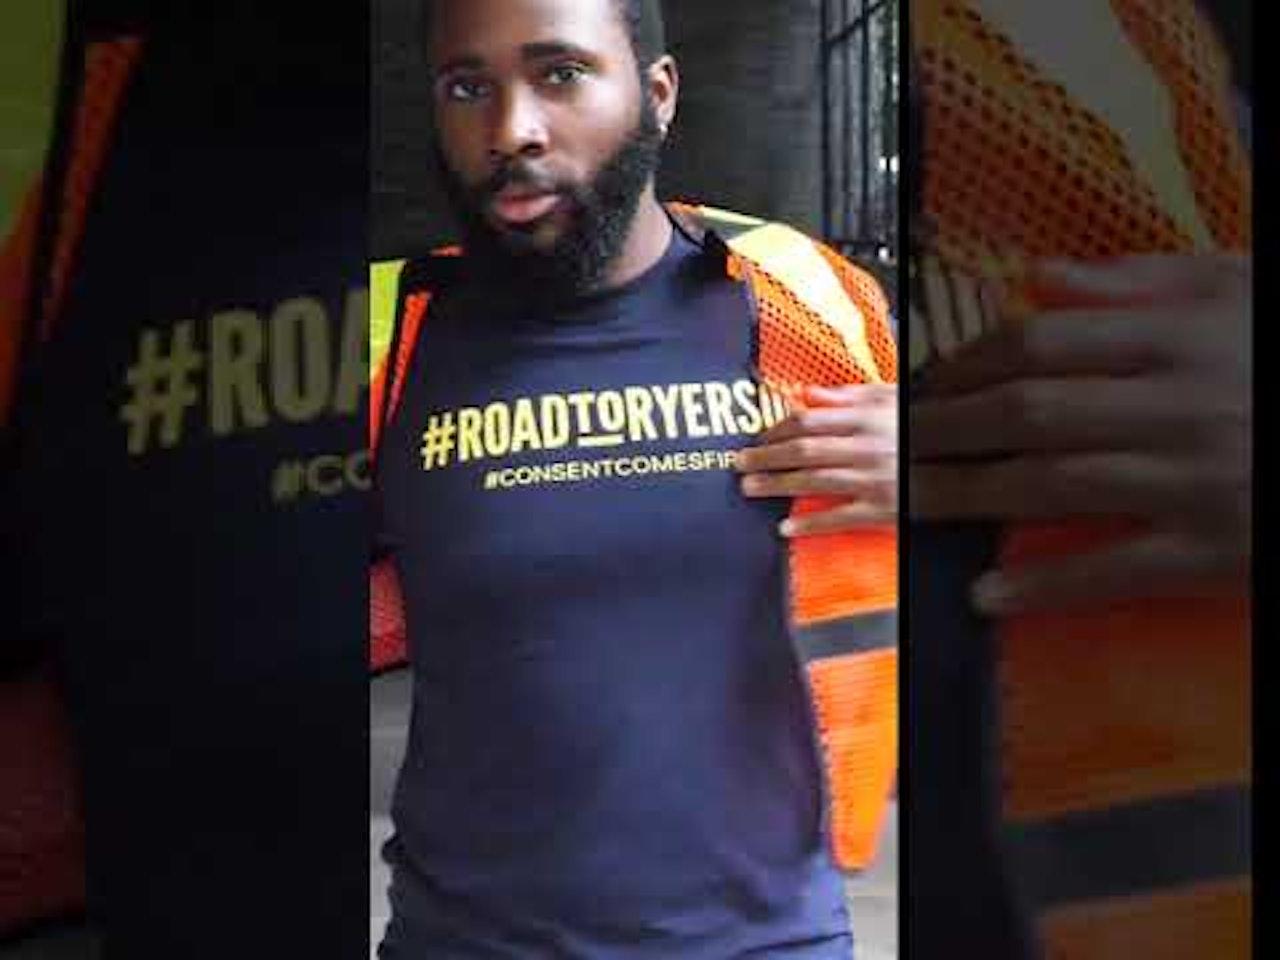 KICK OFF - INSTA STORY TEASER: #RoadtoRyerson 2018